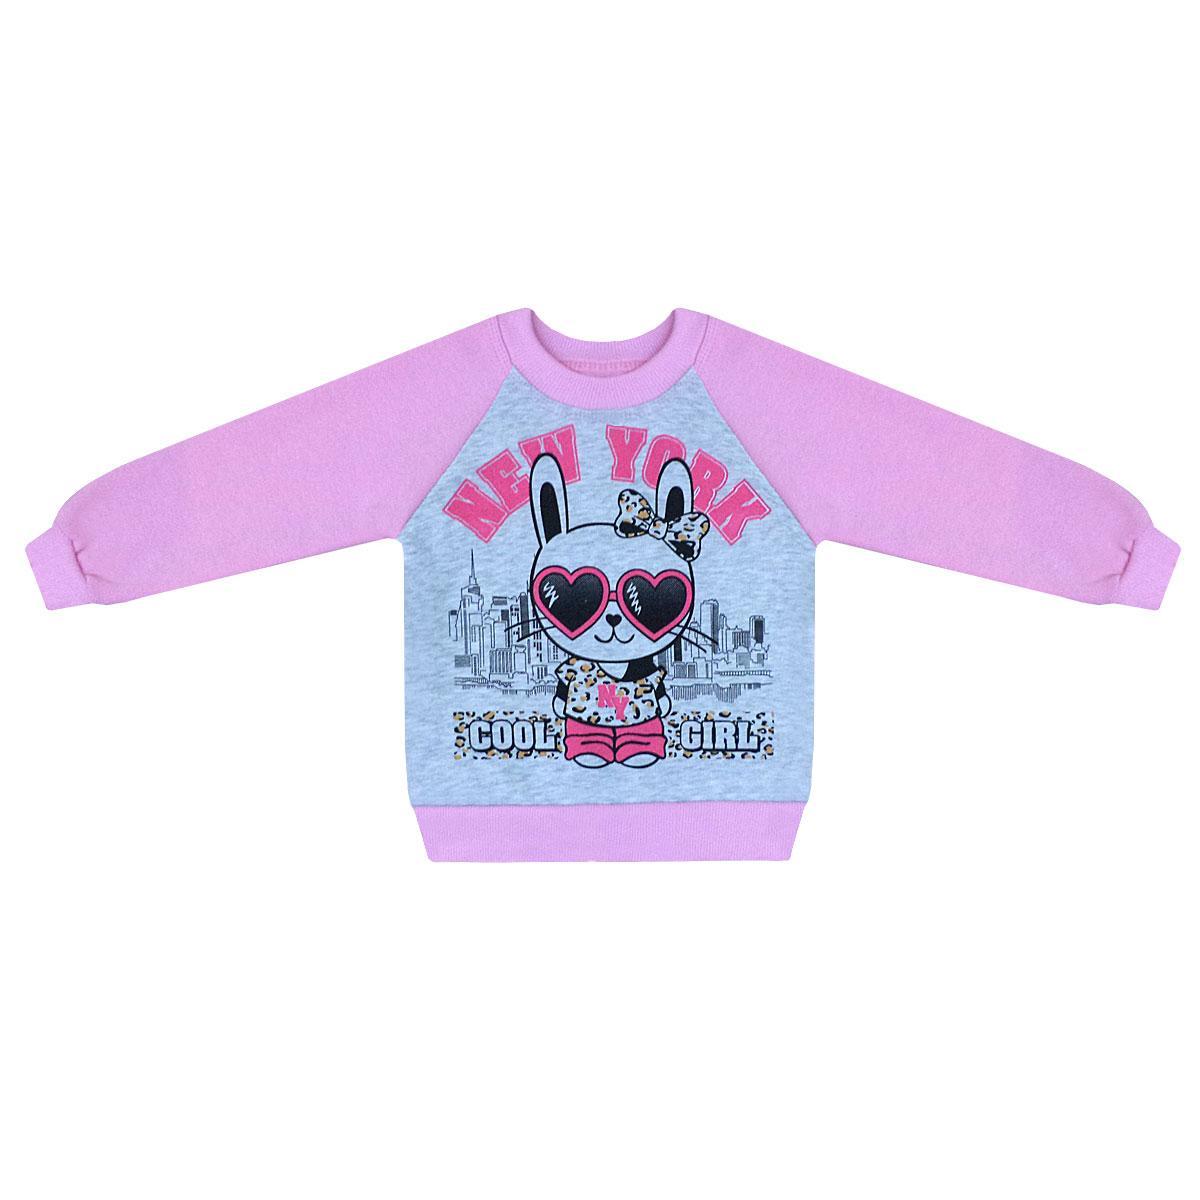 Детский реглан для девочки  Cool Girl на 2-5 лет трехнитка